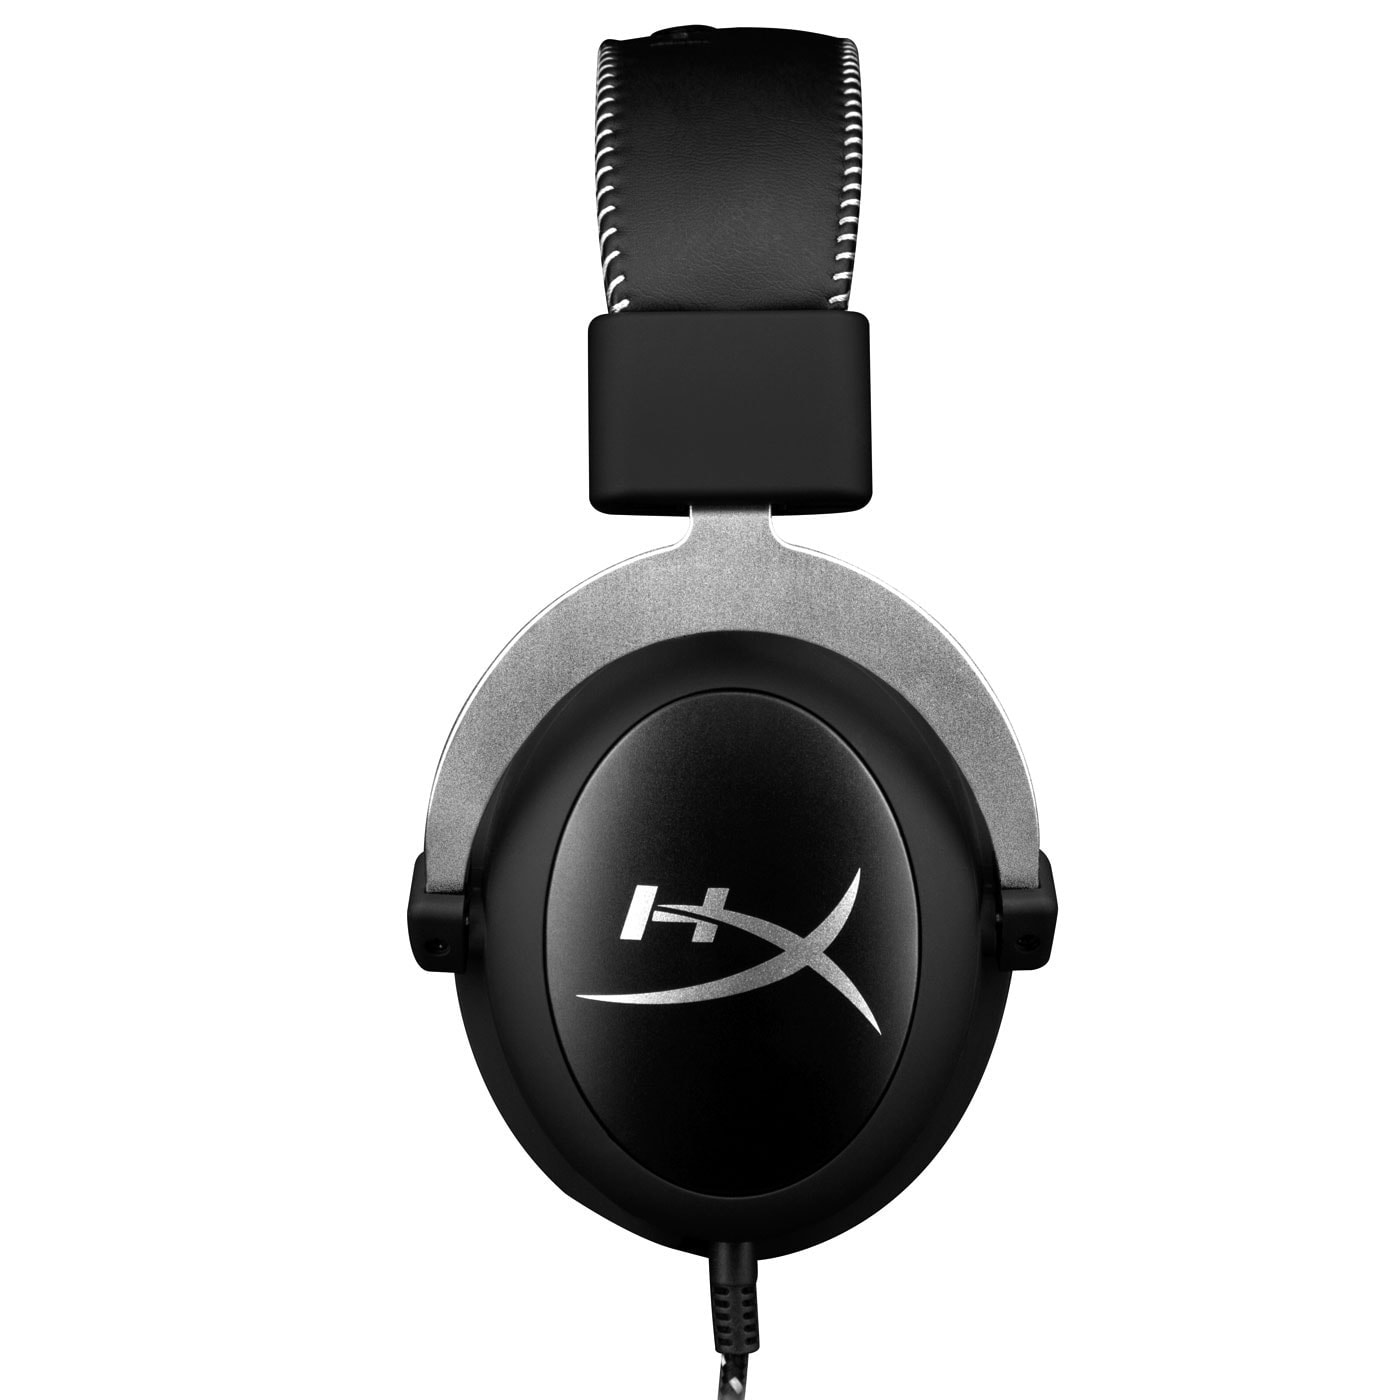 HyperX CloudX Gaming Headset (Silver) (HX-HSCX-SR/EM) - Achat / Vente Micro-casque sur Cybertek.fr - 1